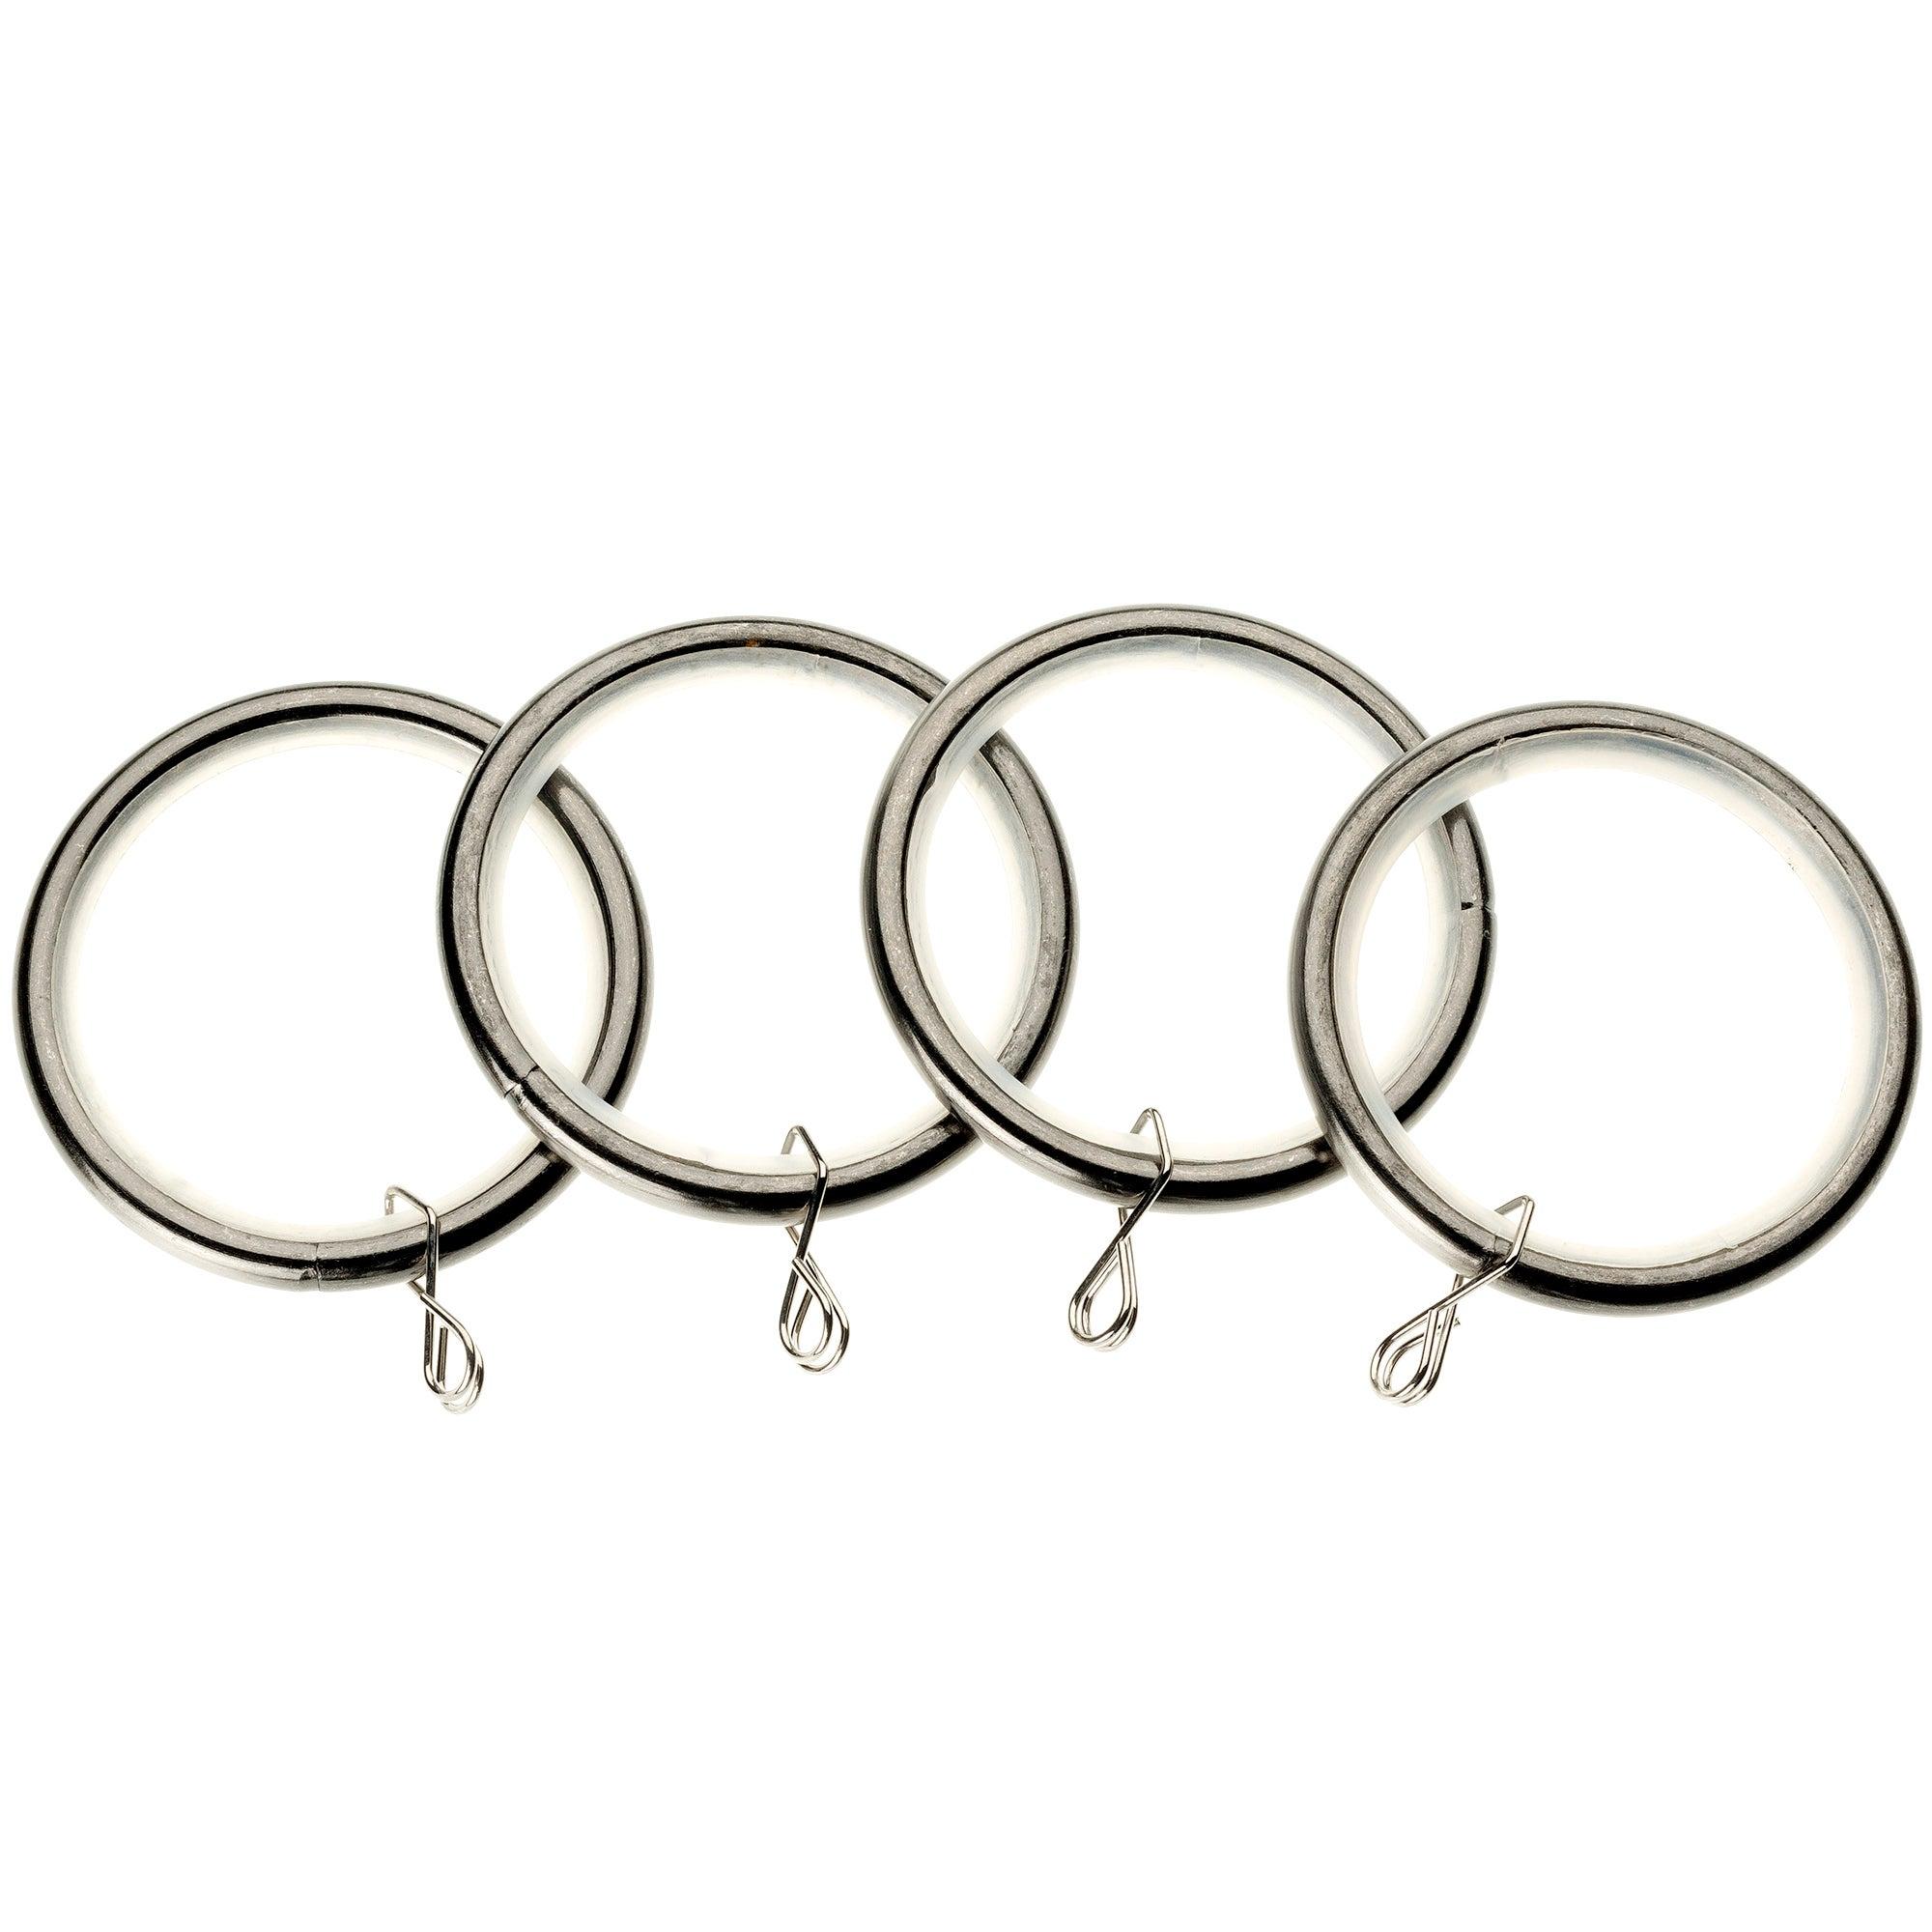 Swish Pack Of 4 Satin Steel Curtain Rings